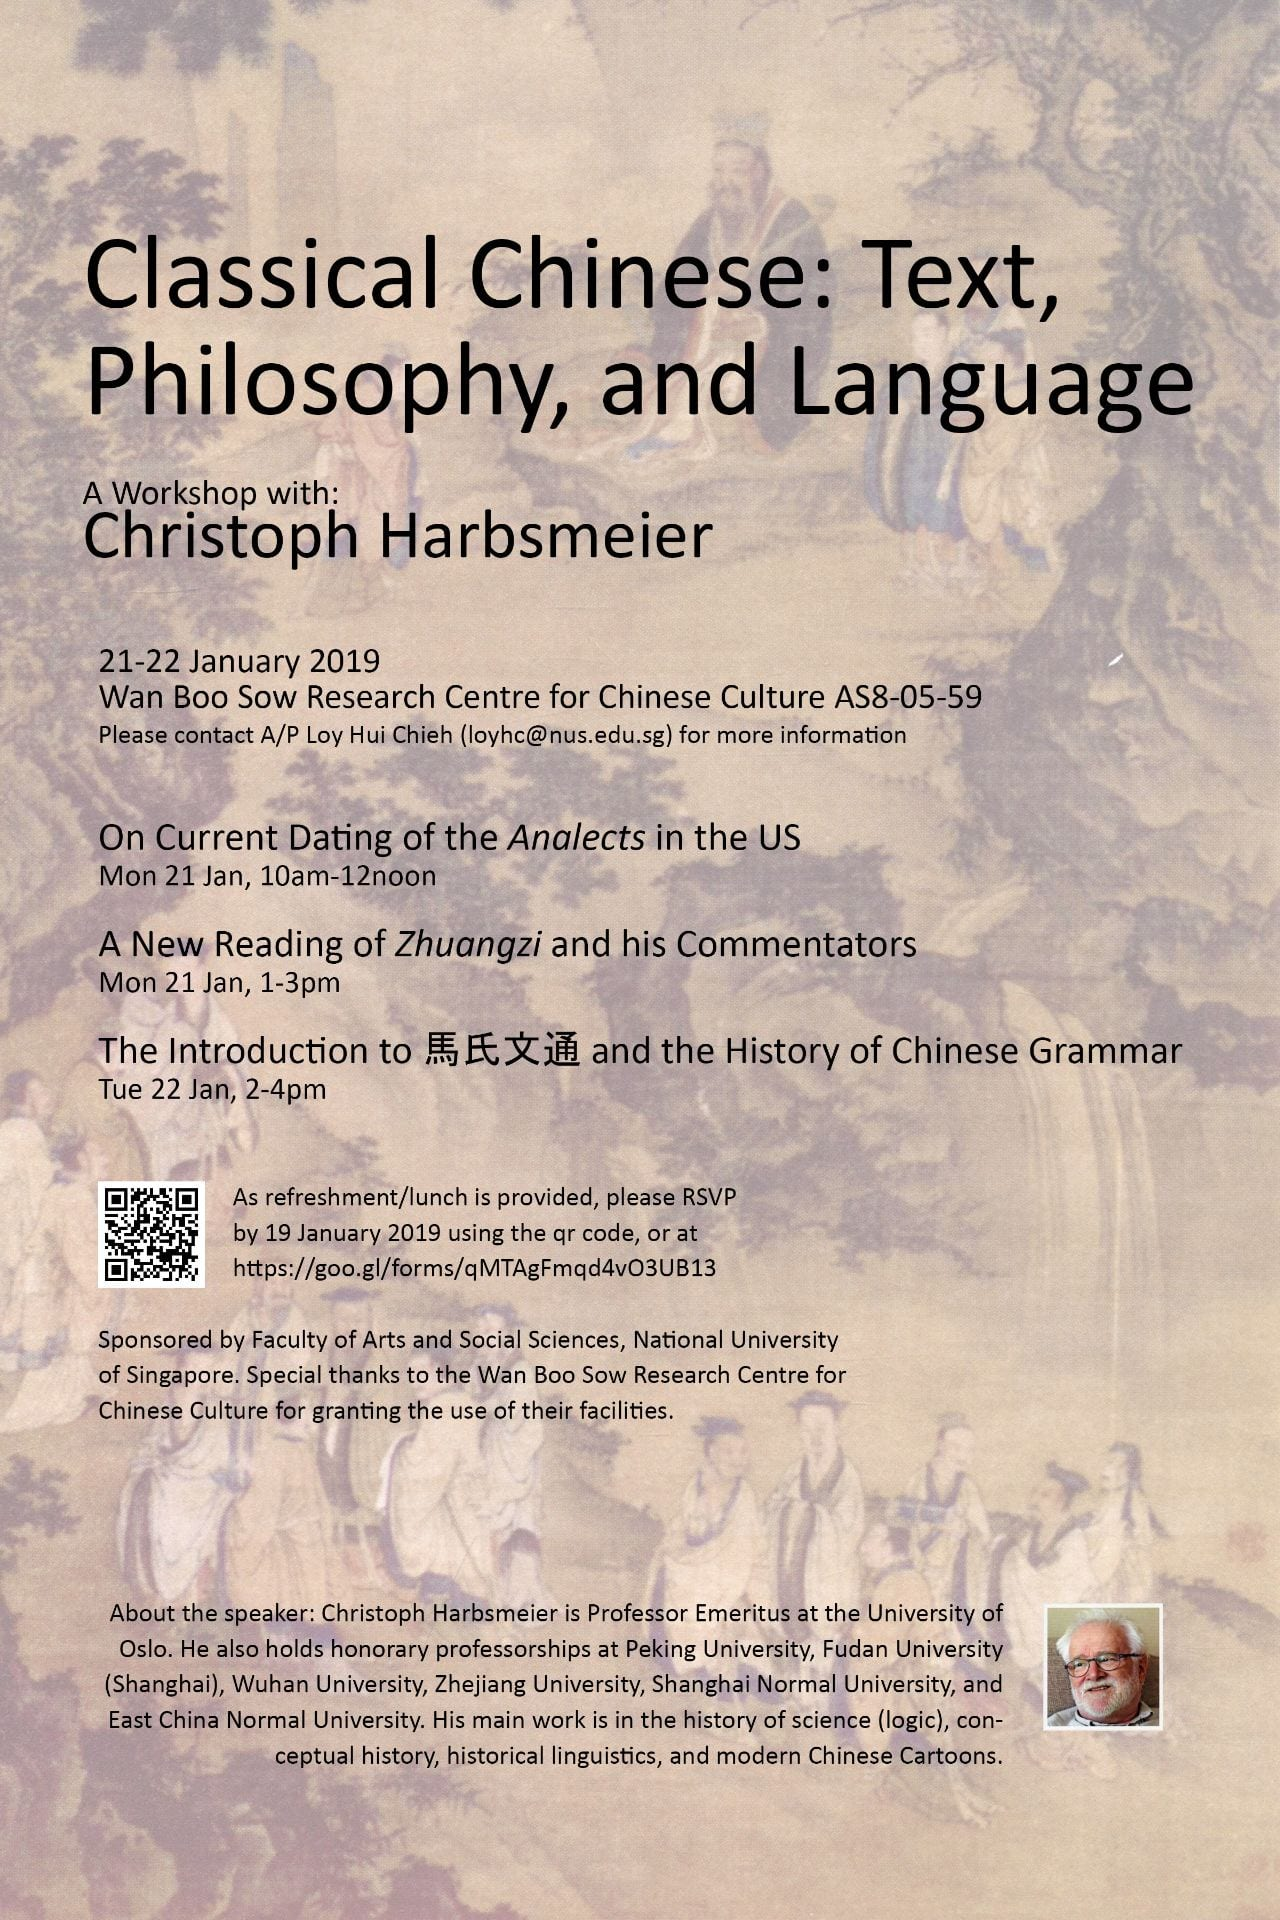 Loy Hui Chieh   philosophy-at-nus